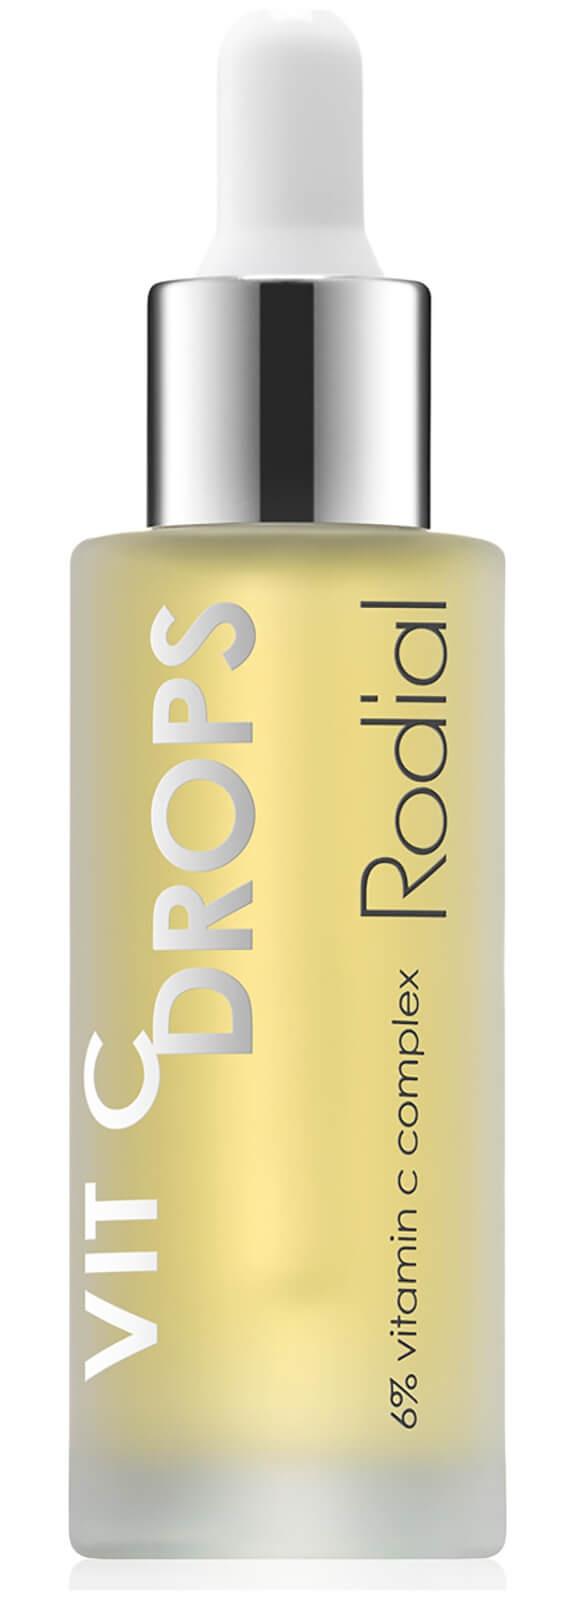 Rodial Vitamin C Drops